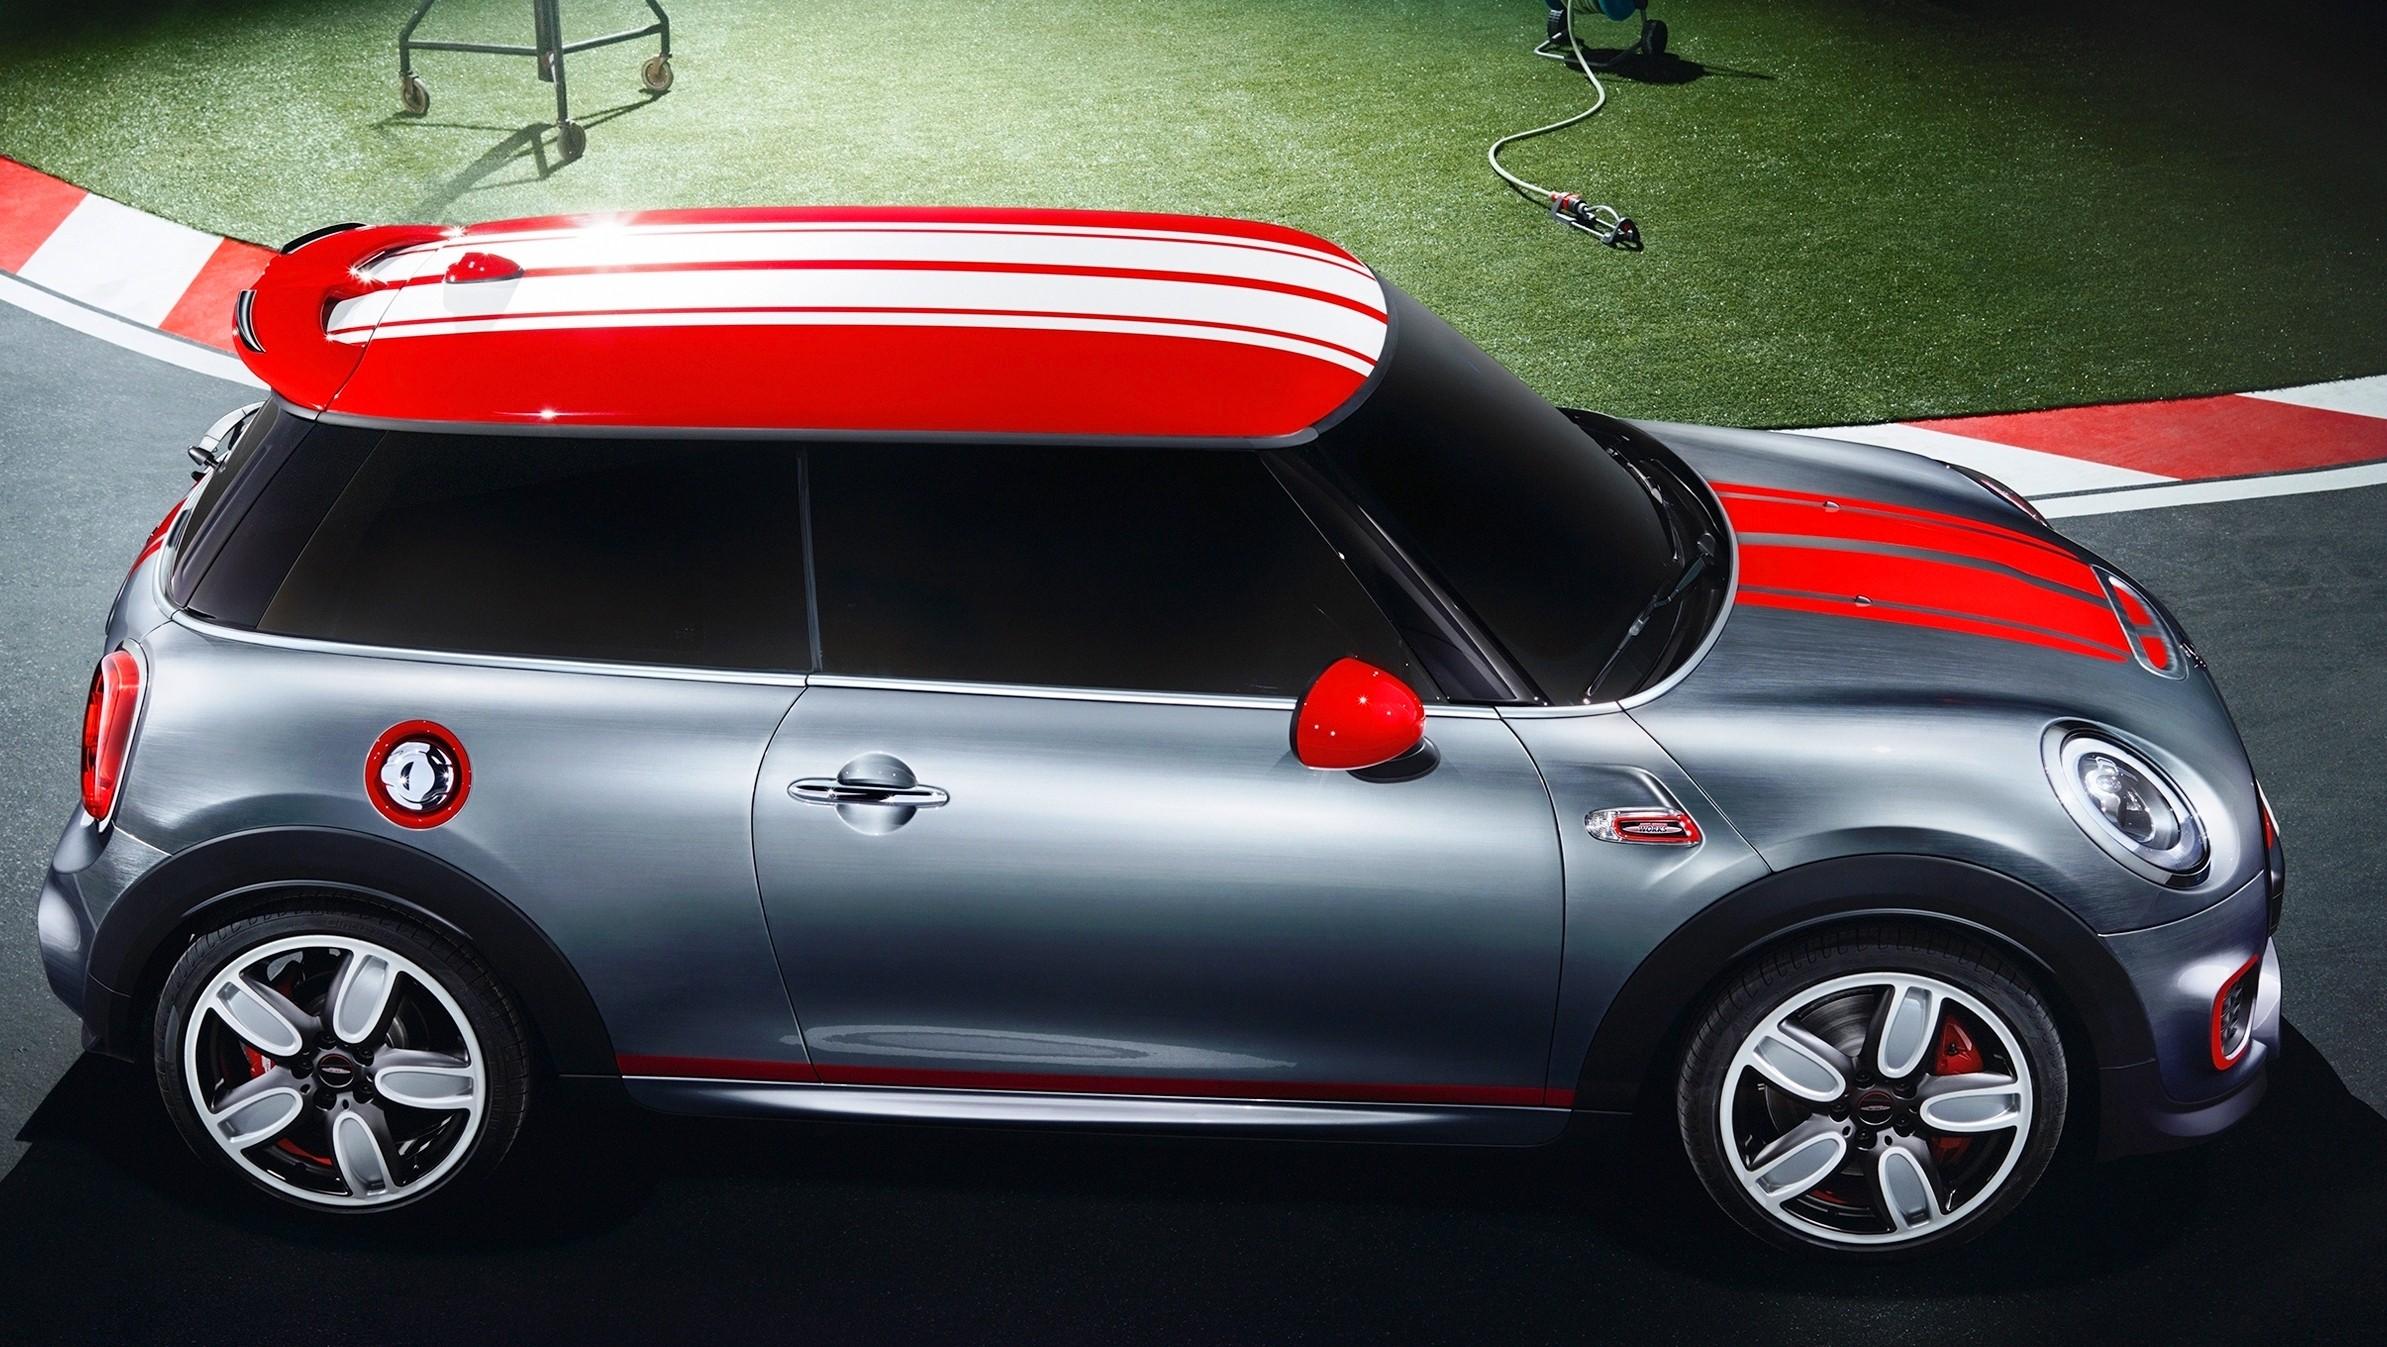 2015 mini cooper jcw concept brushed alloy paints hot bod 12. Black Bedroom Furniture Sets. Home Design Ideas